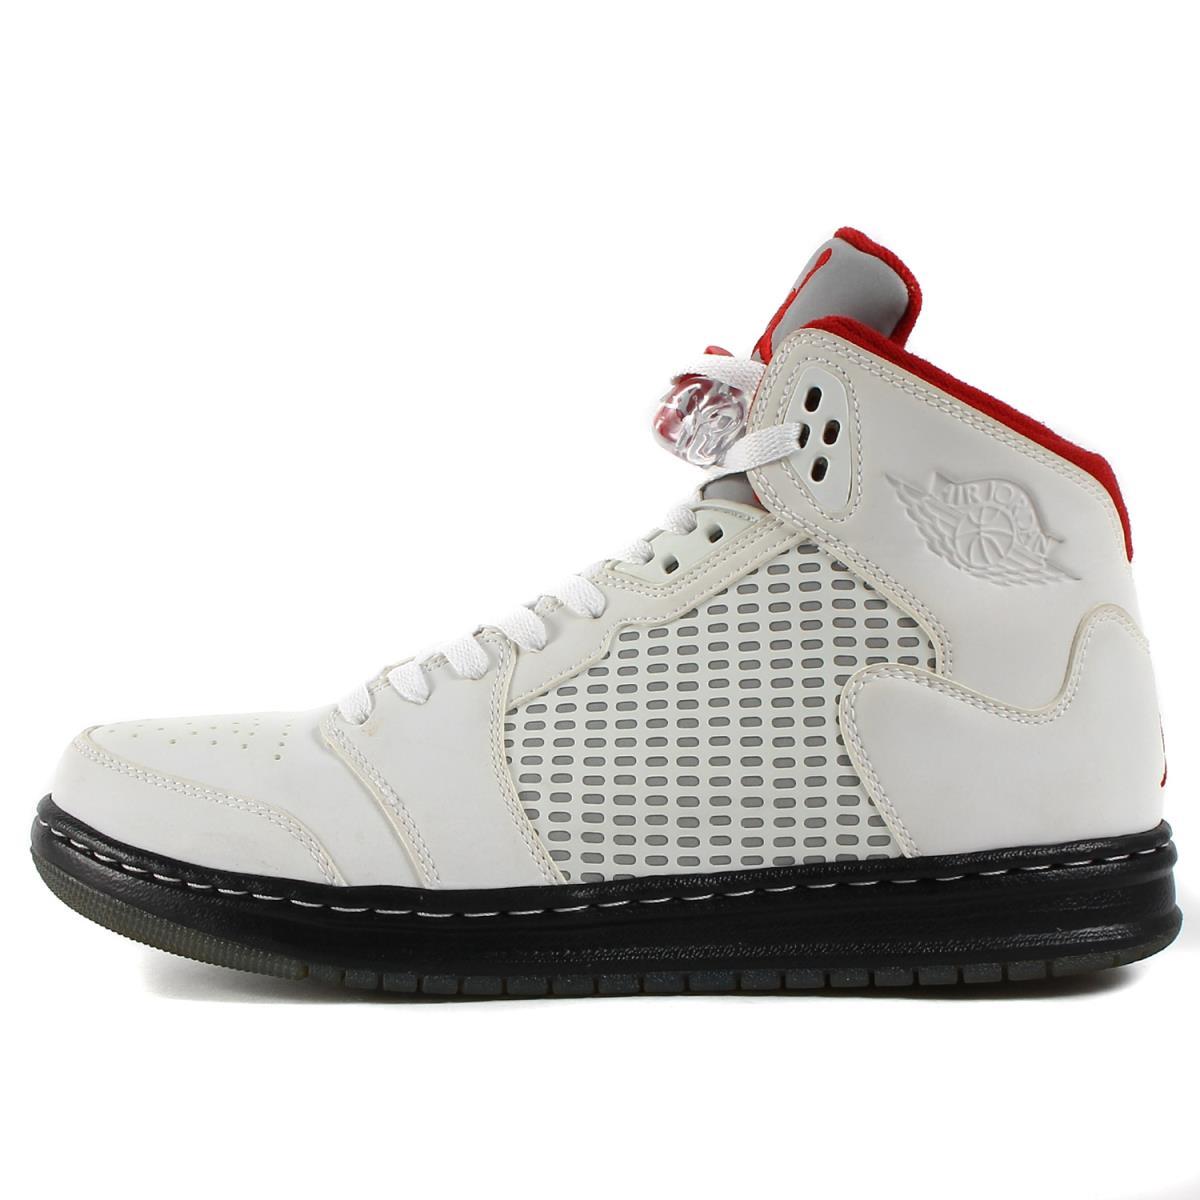 watch d4fd4 4fdb4 NIKE (Nike) JORDAN PRIME 5 (429,489-102) white X bar city red US8(26cm)